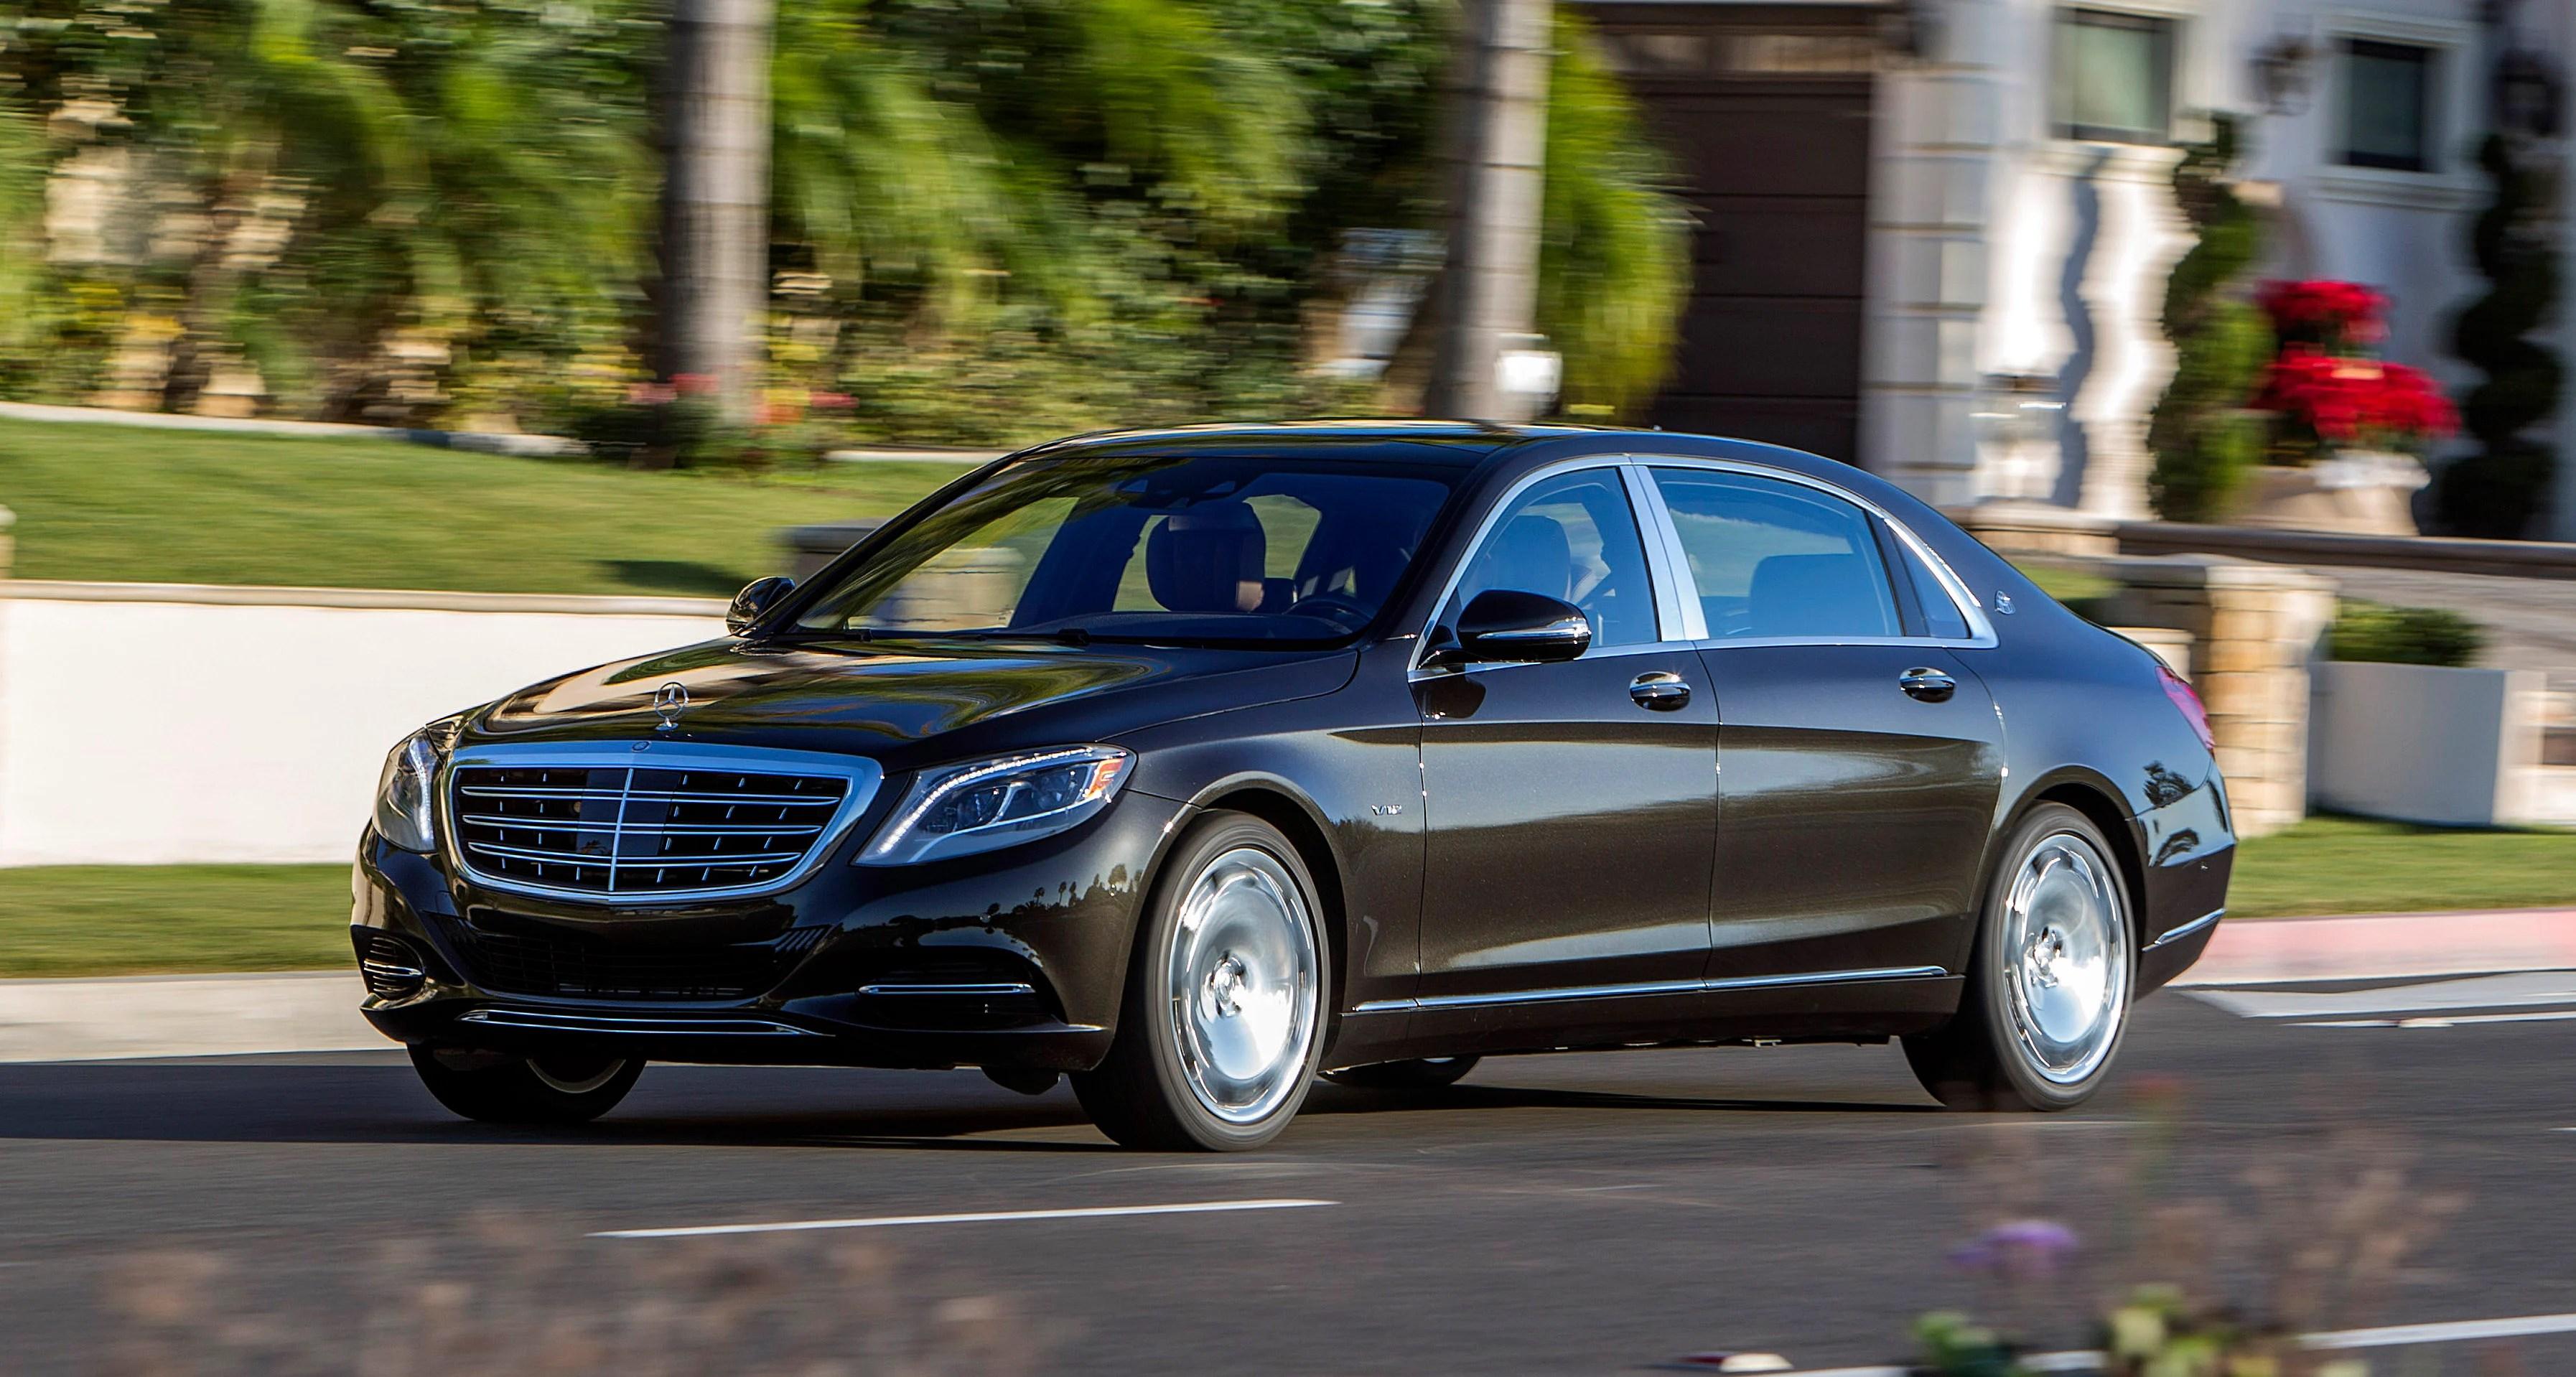 Mercedes Maybach S Class Review Photos CarAdvice